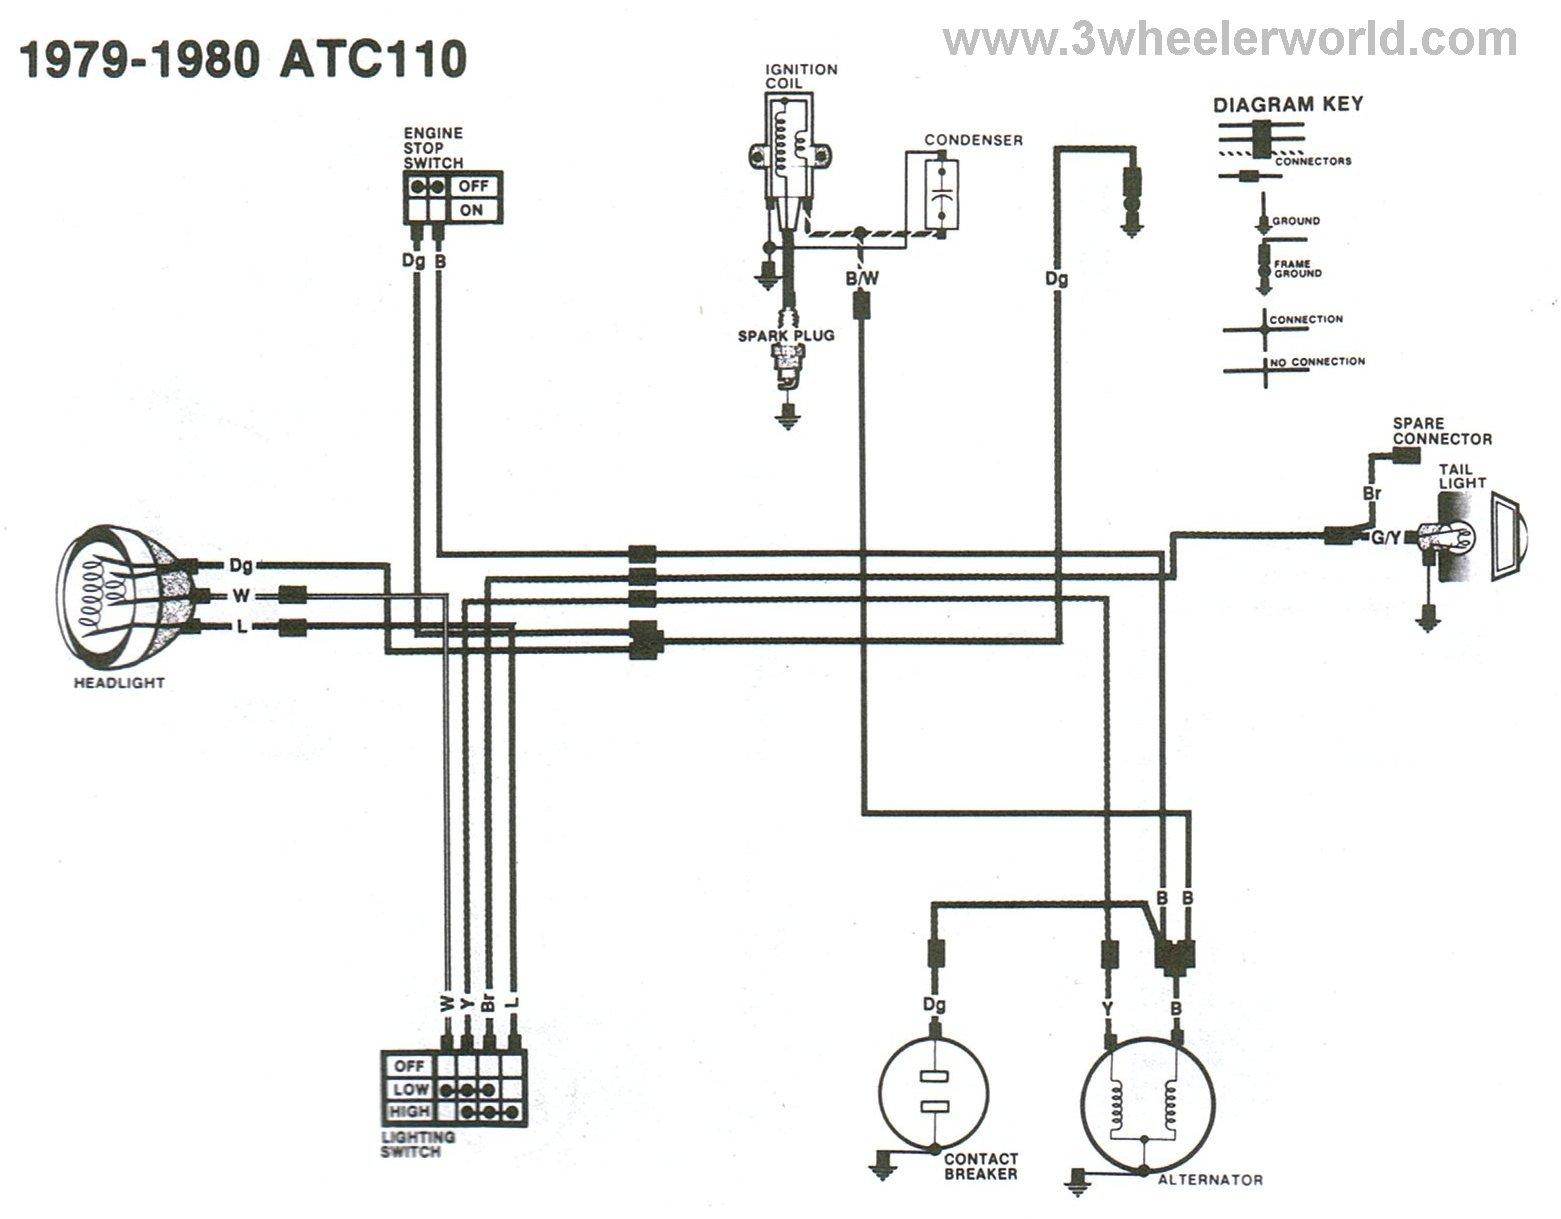 lifan 110 wiring diagram    3wheelerworld.com